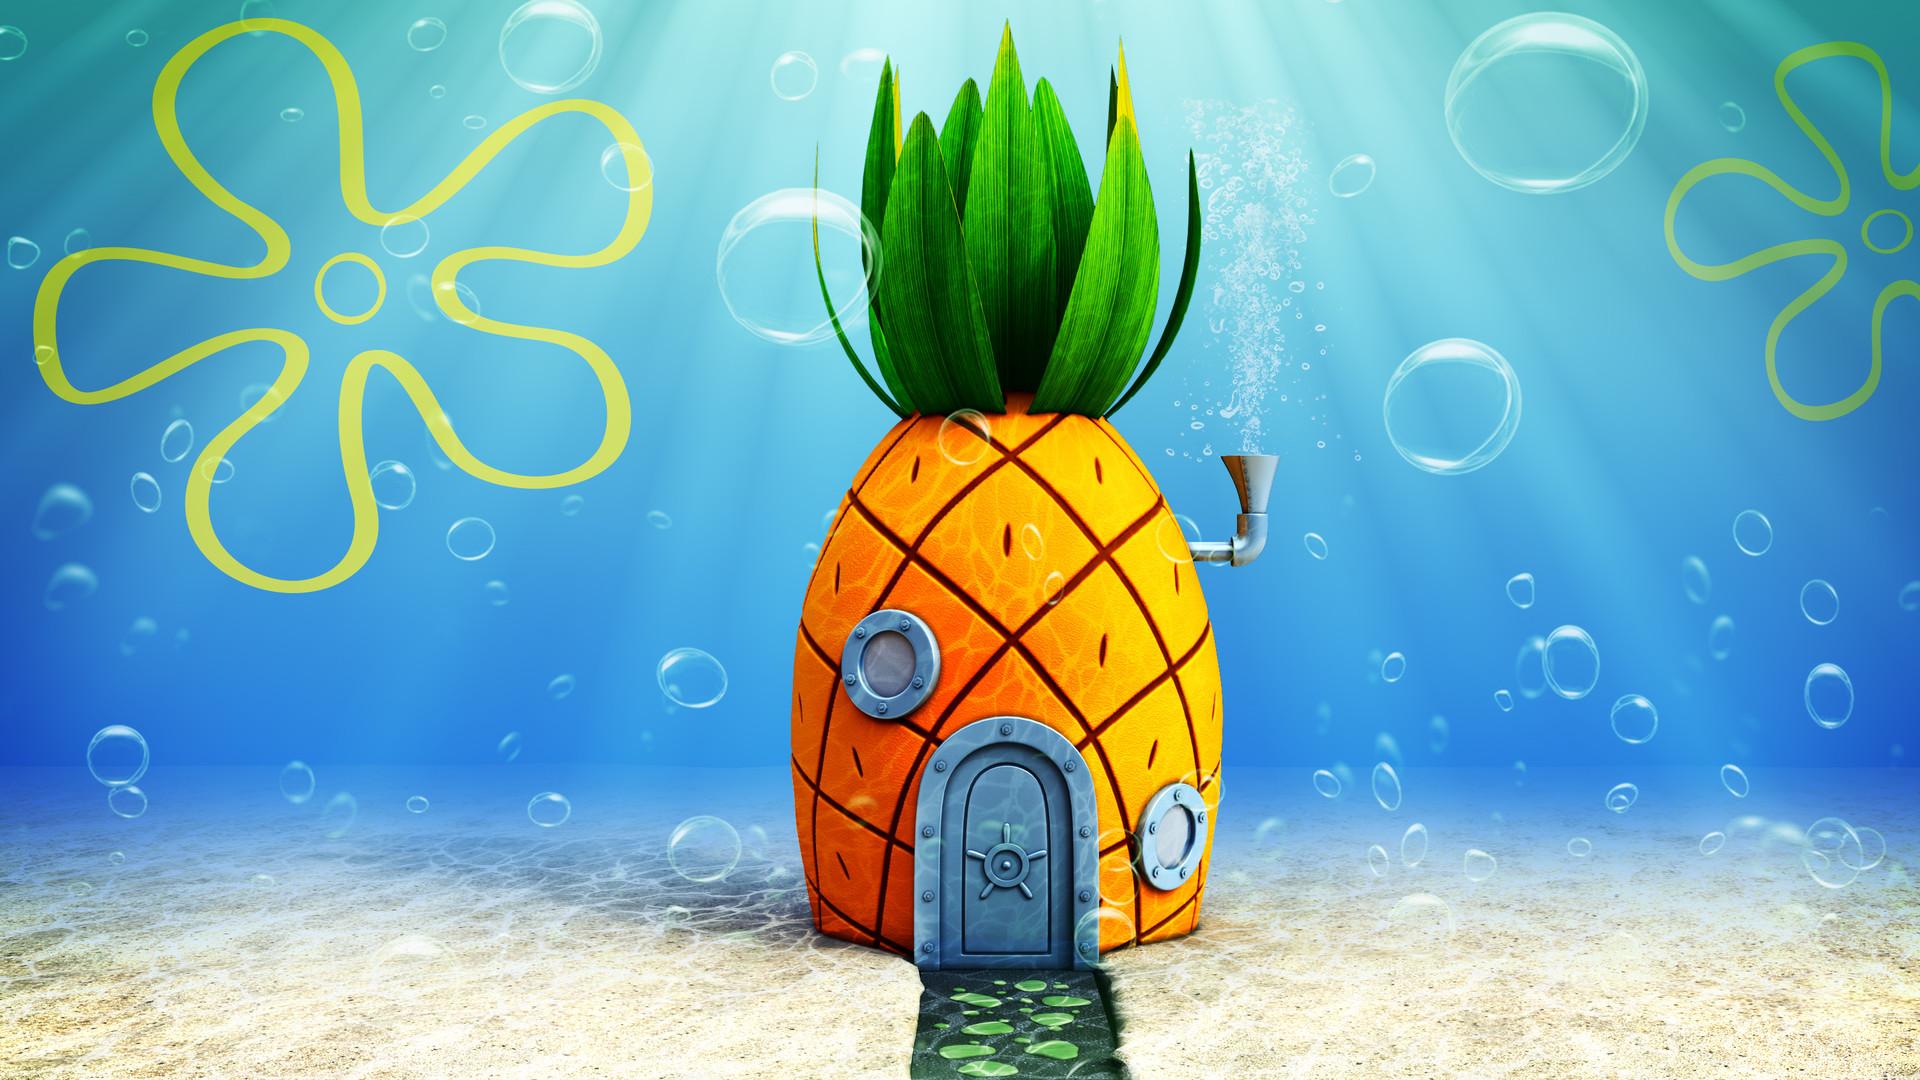 gabriel goldner - 3d - house of spongebob squarepants